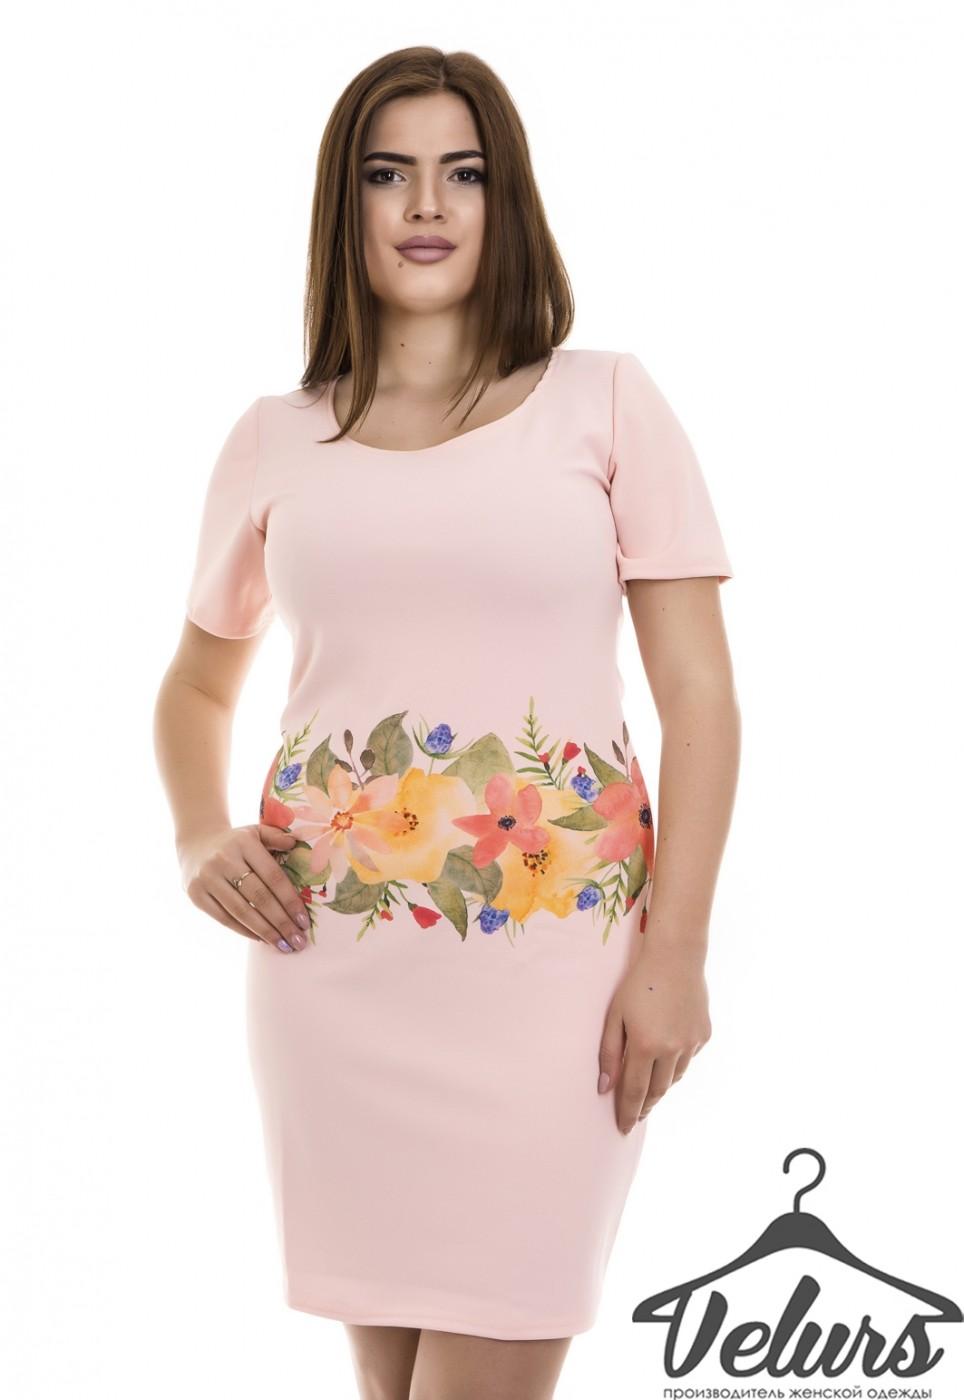 Velurs: Платье 212126 - фото 23